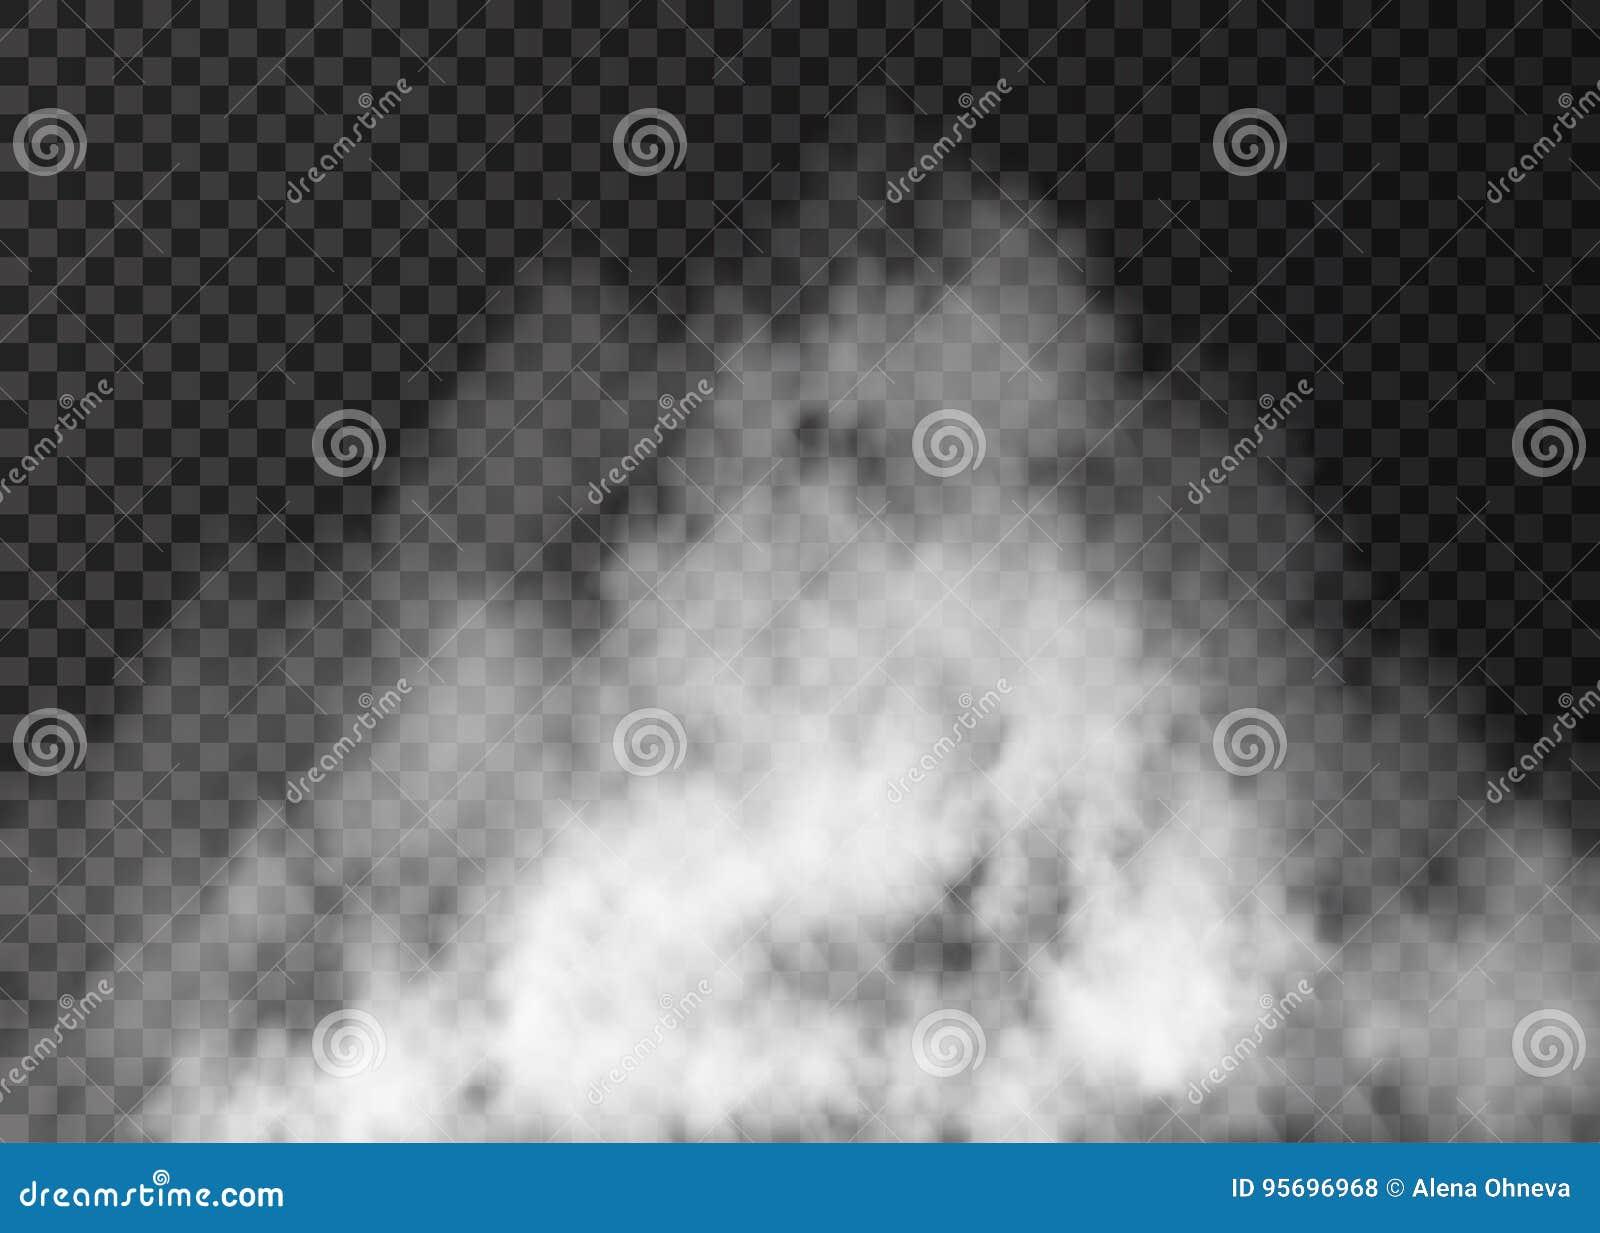 white fog effect isolated on transparent background stock